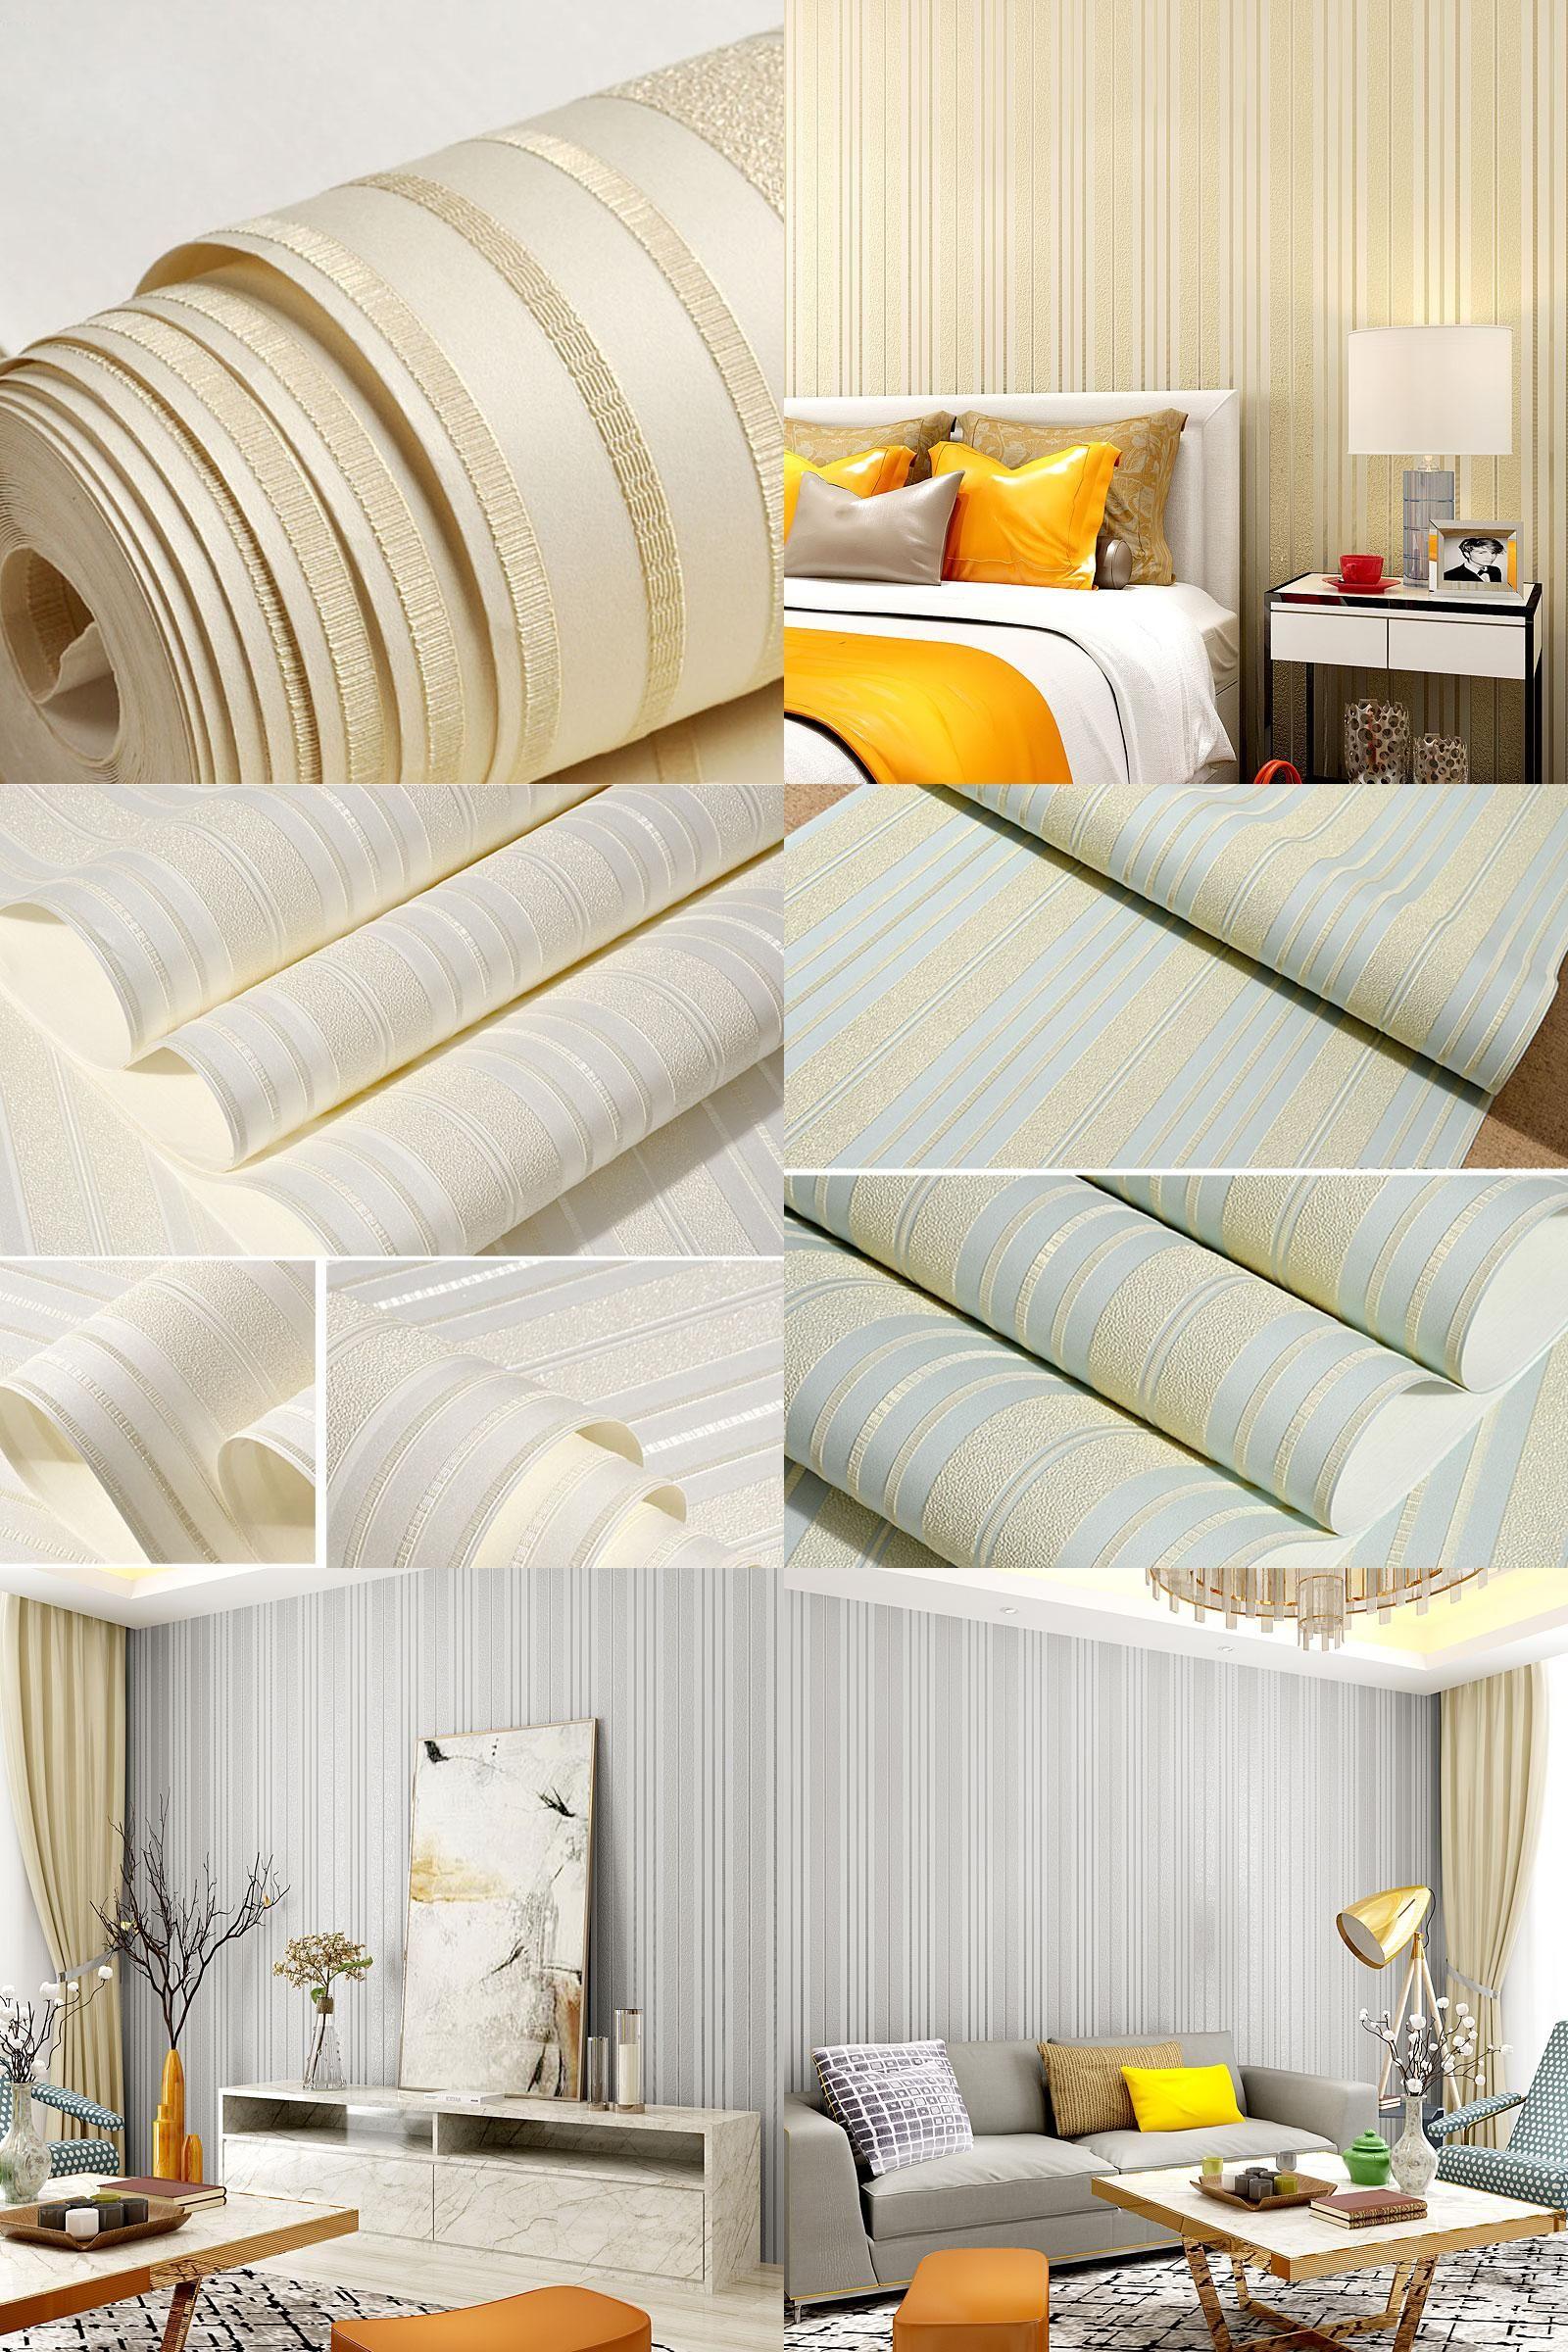 [Visit to Buy] Vertical Stripe Wallpaper Roll Pink Creamy